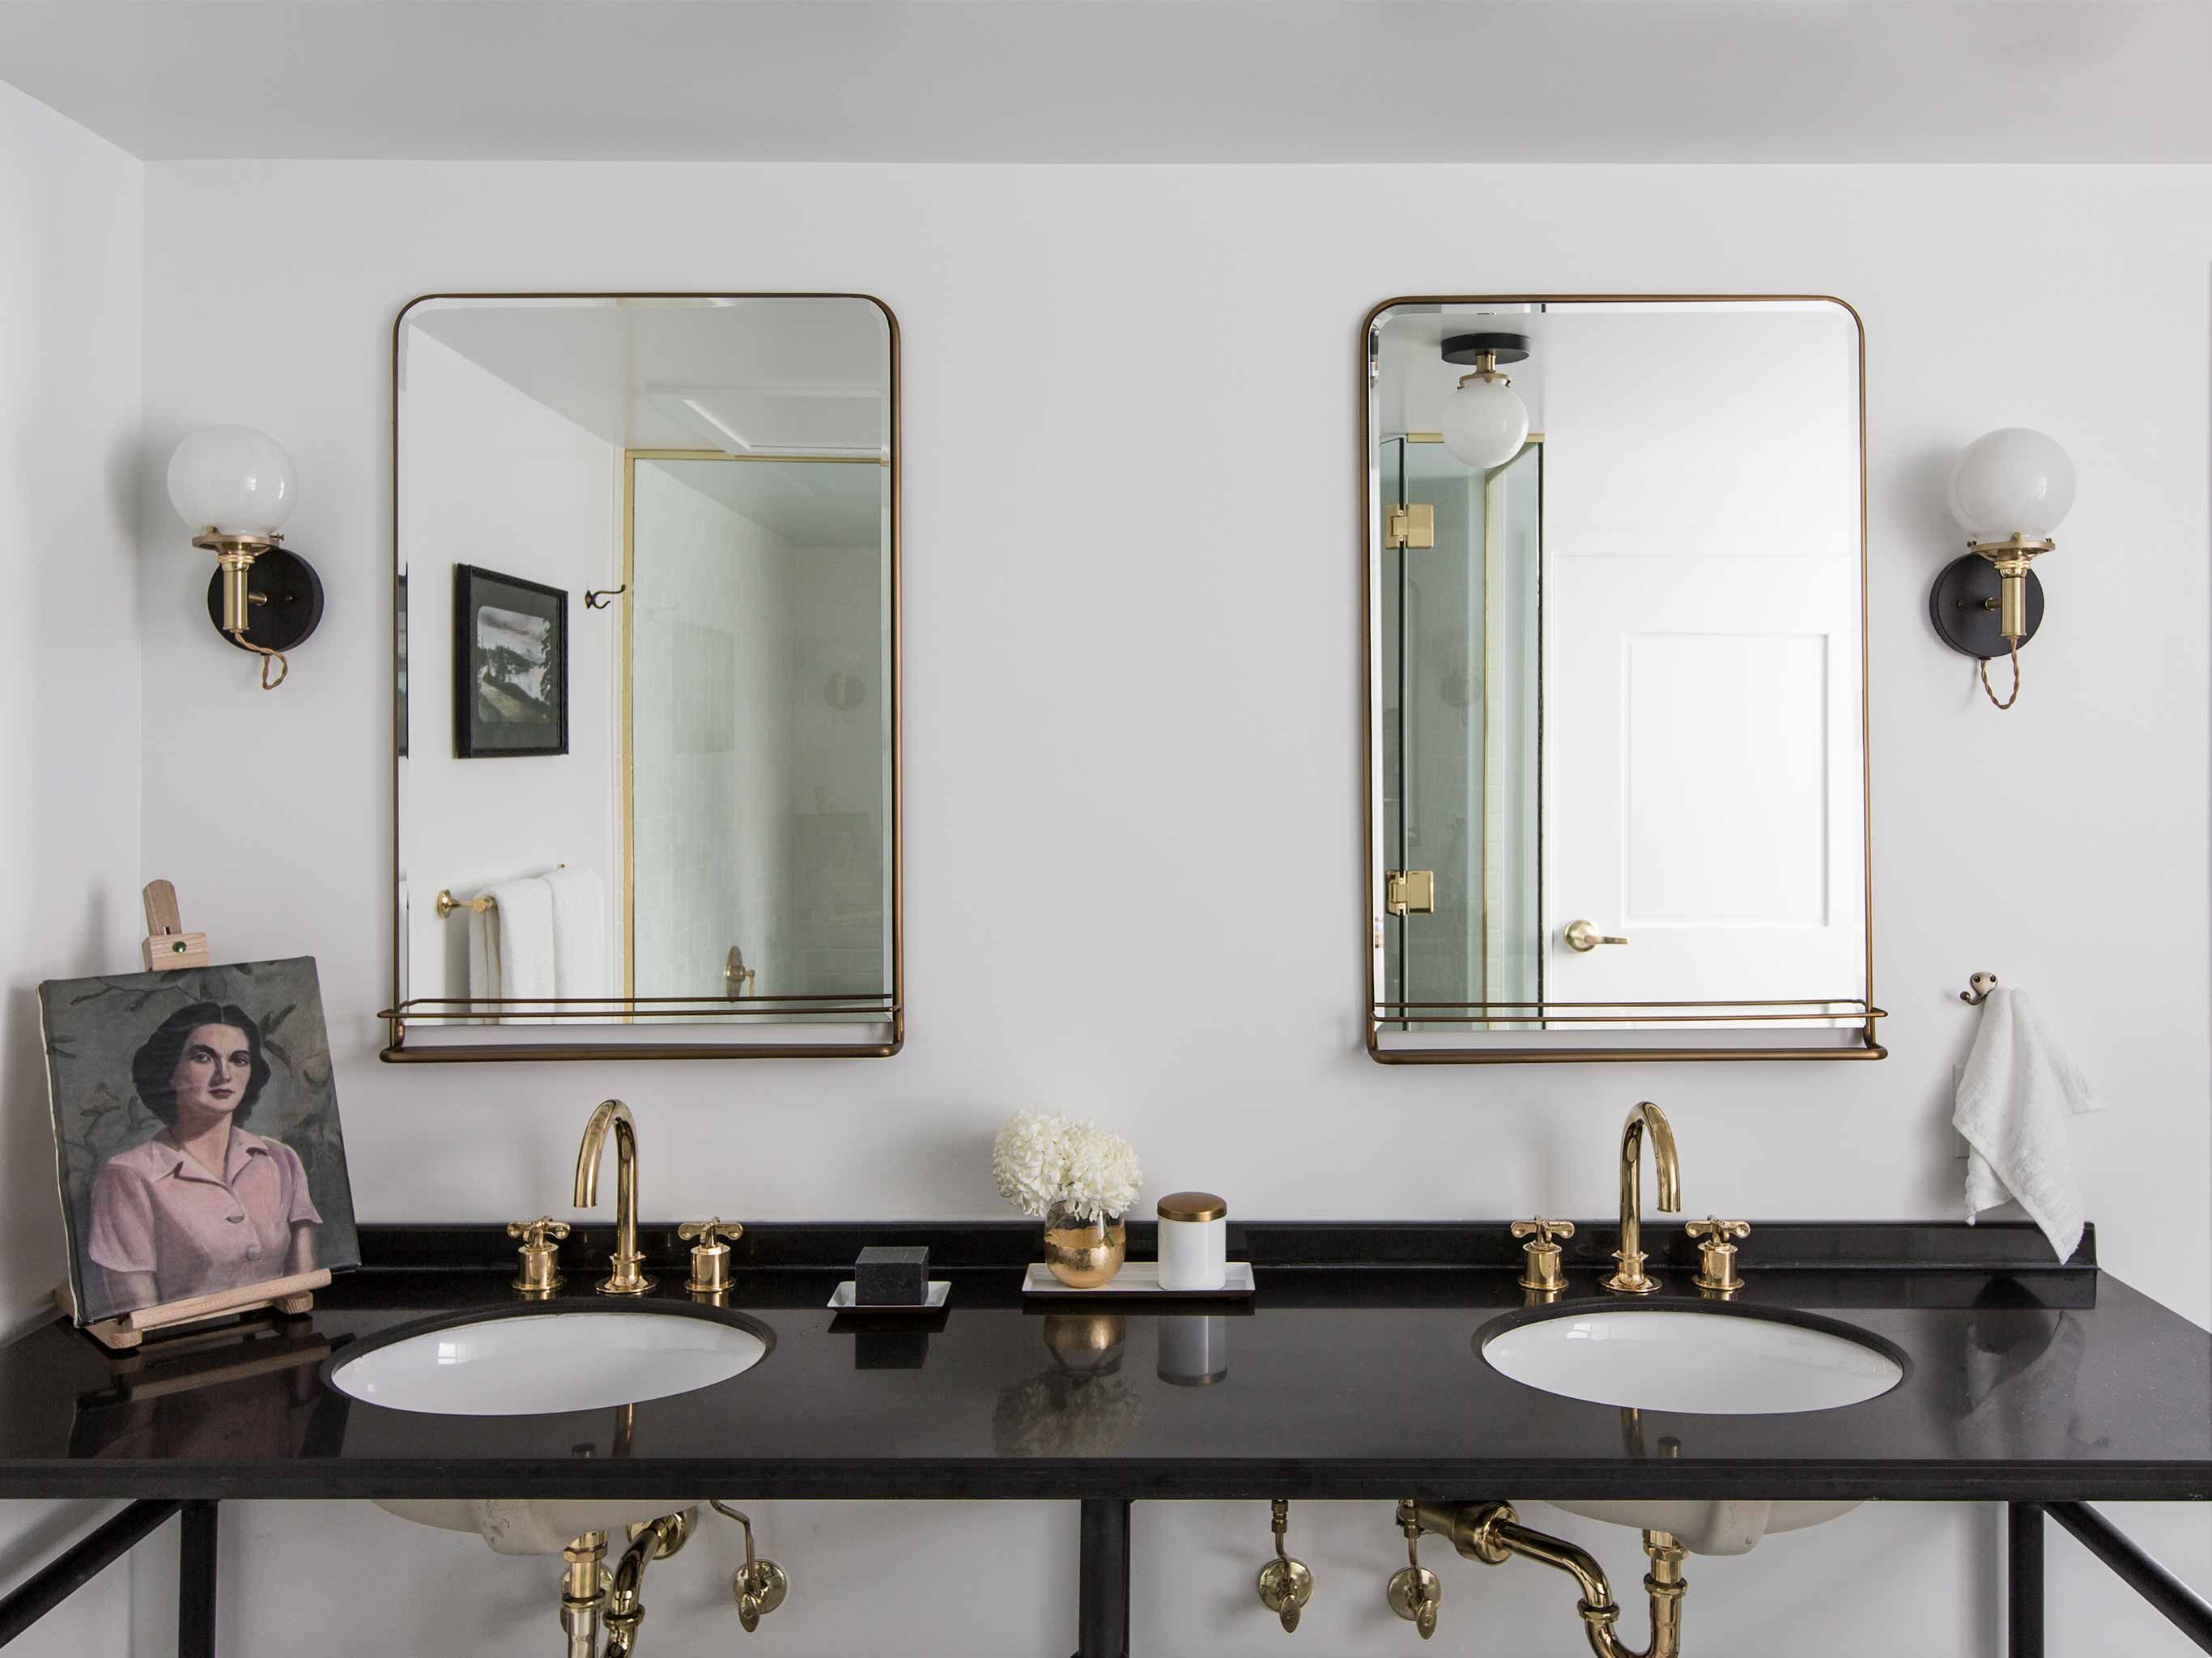 bathroom mirrors seattle. 10-NICOLEHOLLIS-THE-PALLADIAN-SEATTLE-BATHROOM-T.jpg ( Bathroom Mirrors Seattle E